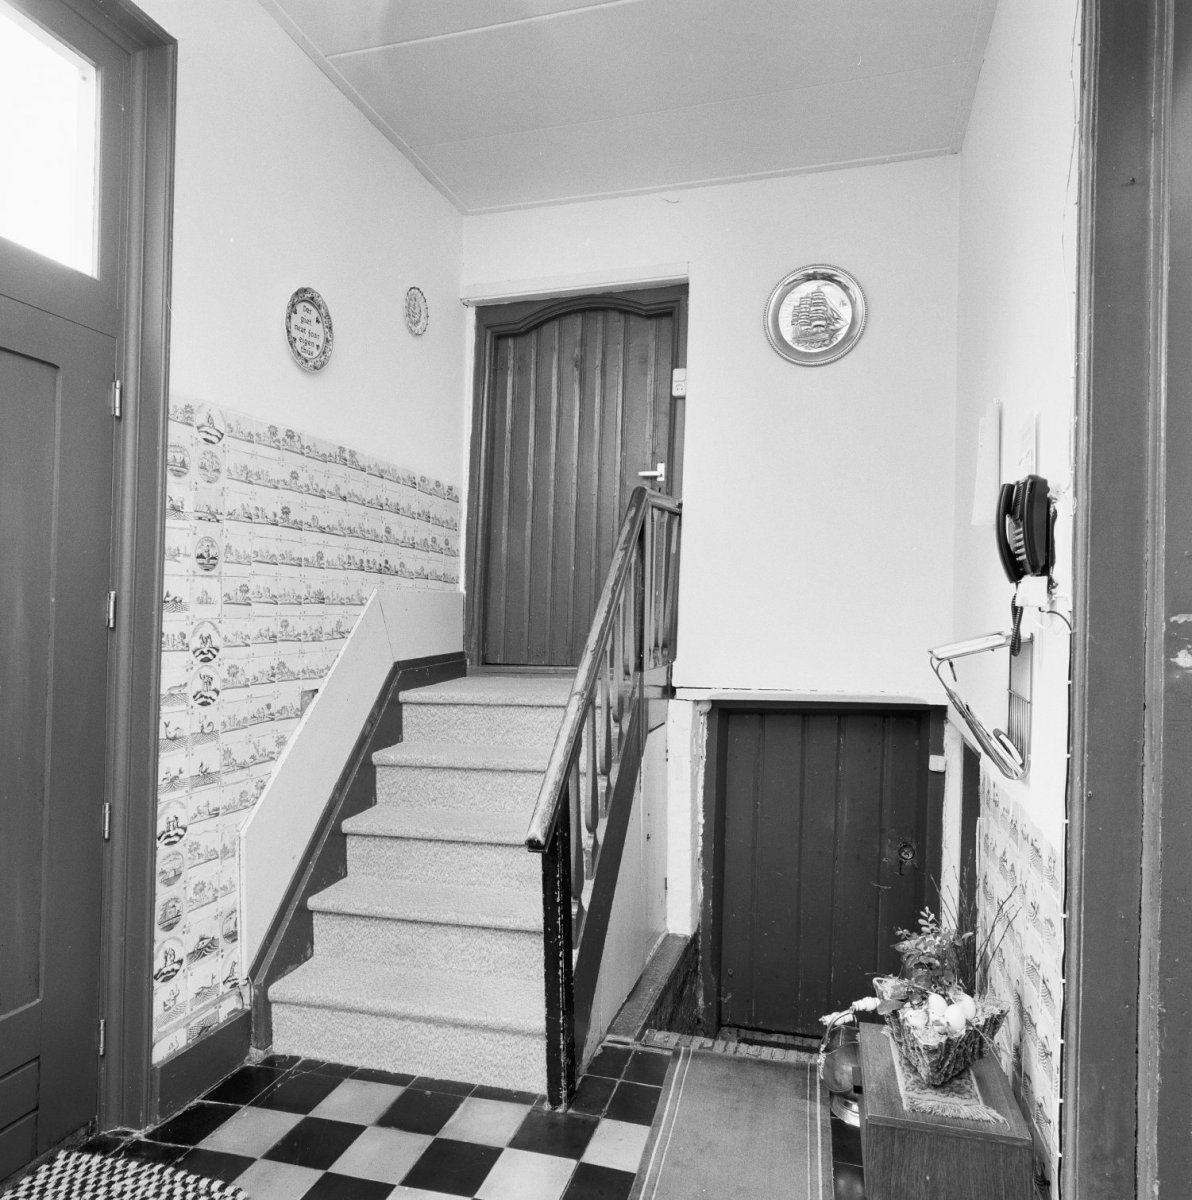 File interieur overzicht hal met beschilderde tegels en trap 20000567 wikimedia - Interieur trap ...